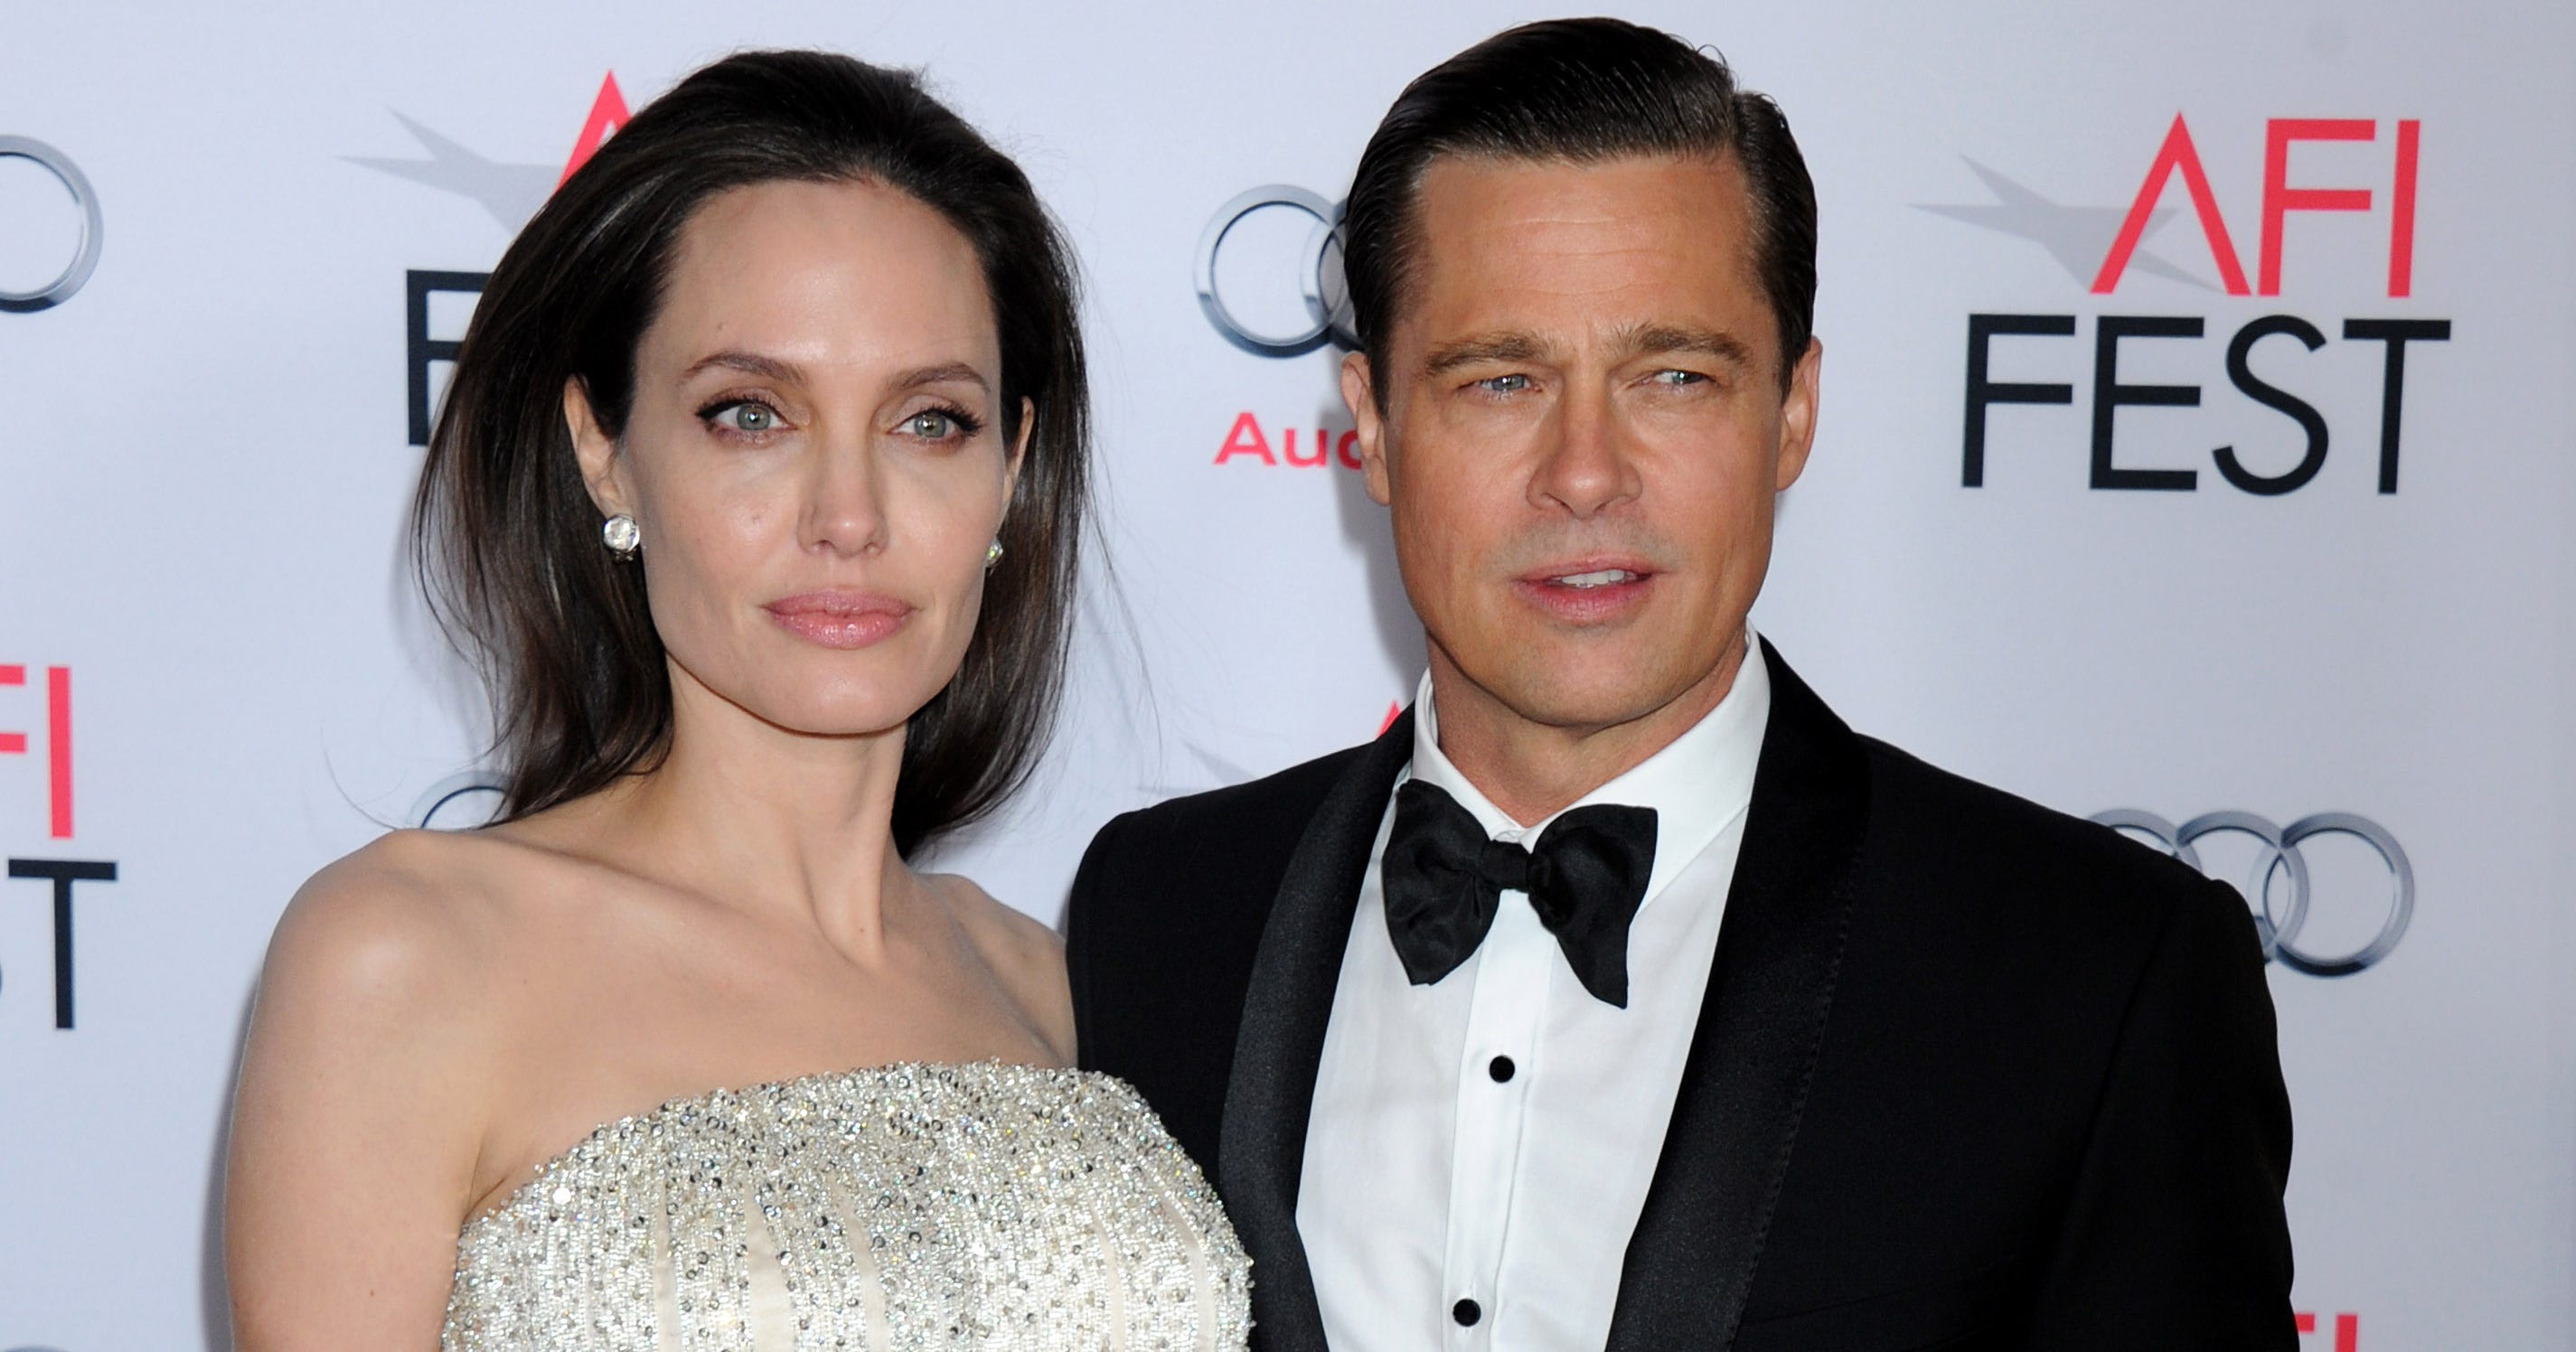 Brad Pitt & Angelina Jolie's Divorce Has Taken A Dramatic Turn